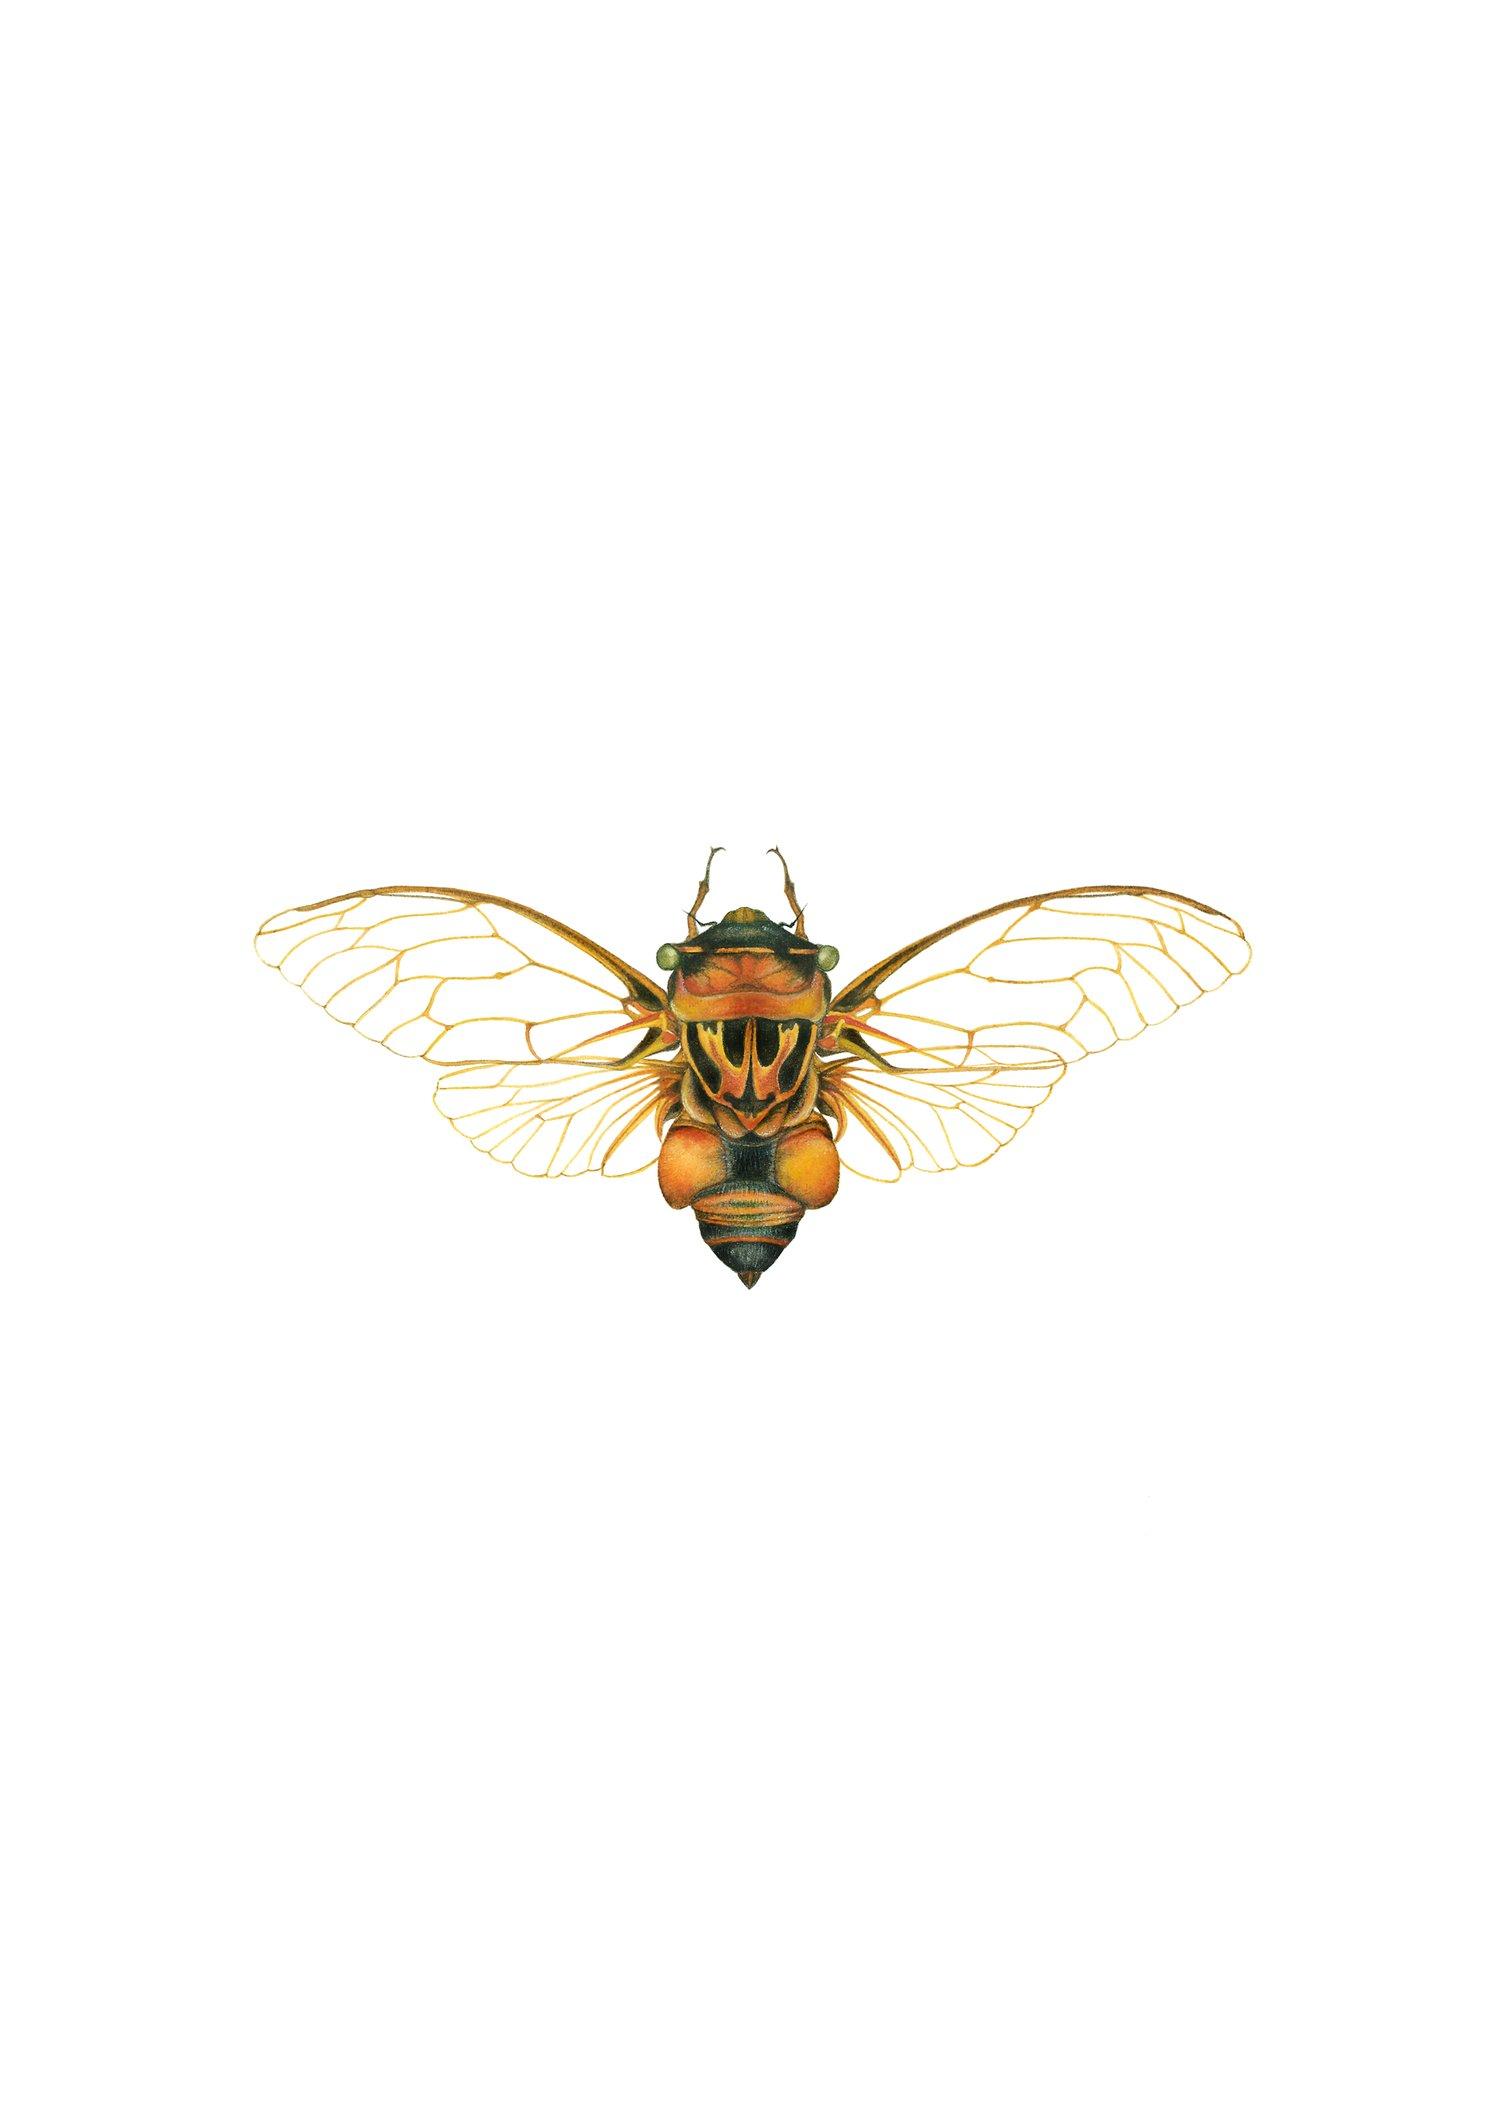 Image of Australian Cicada